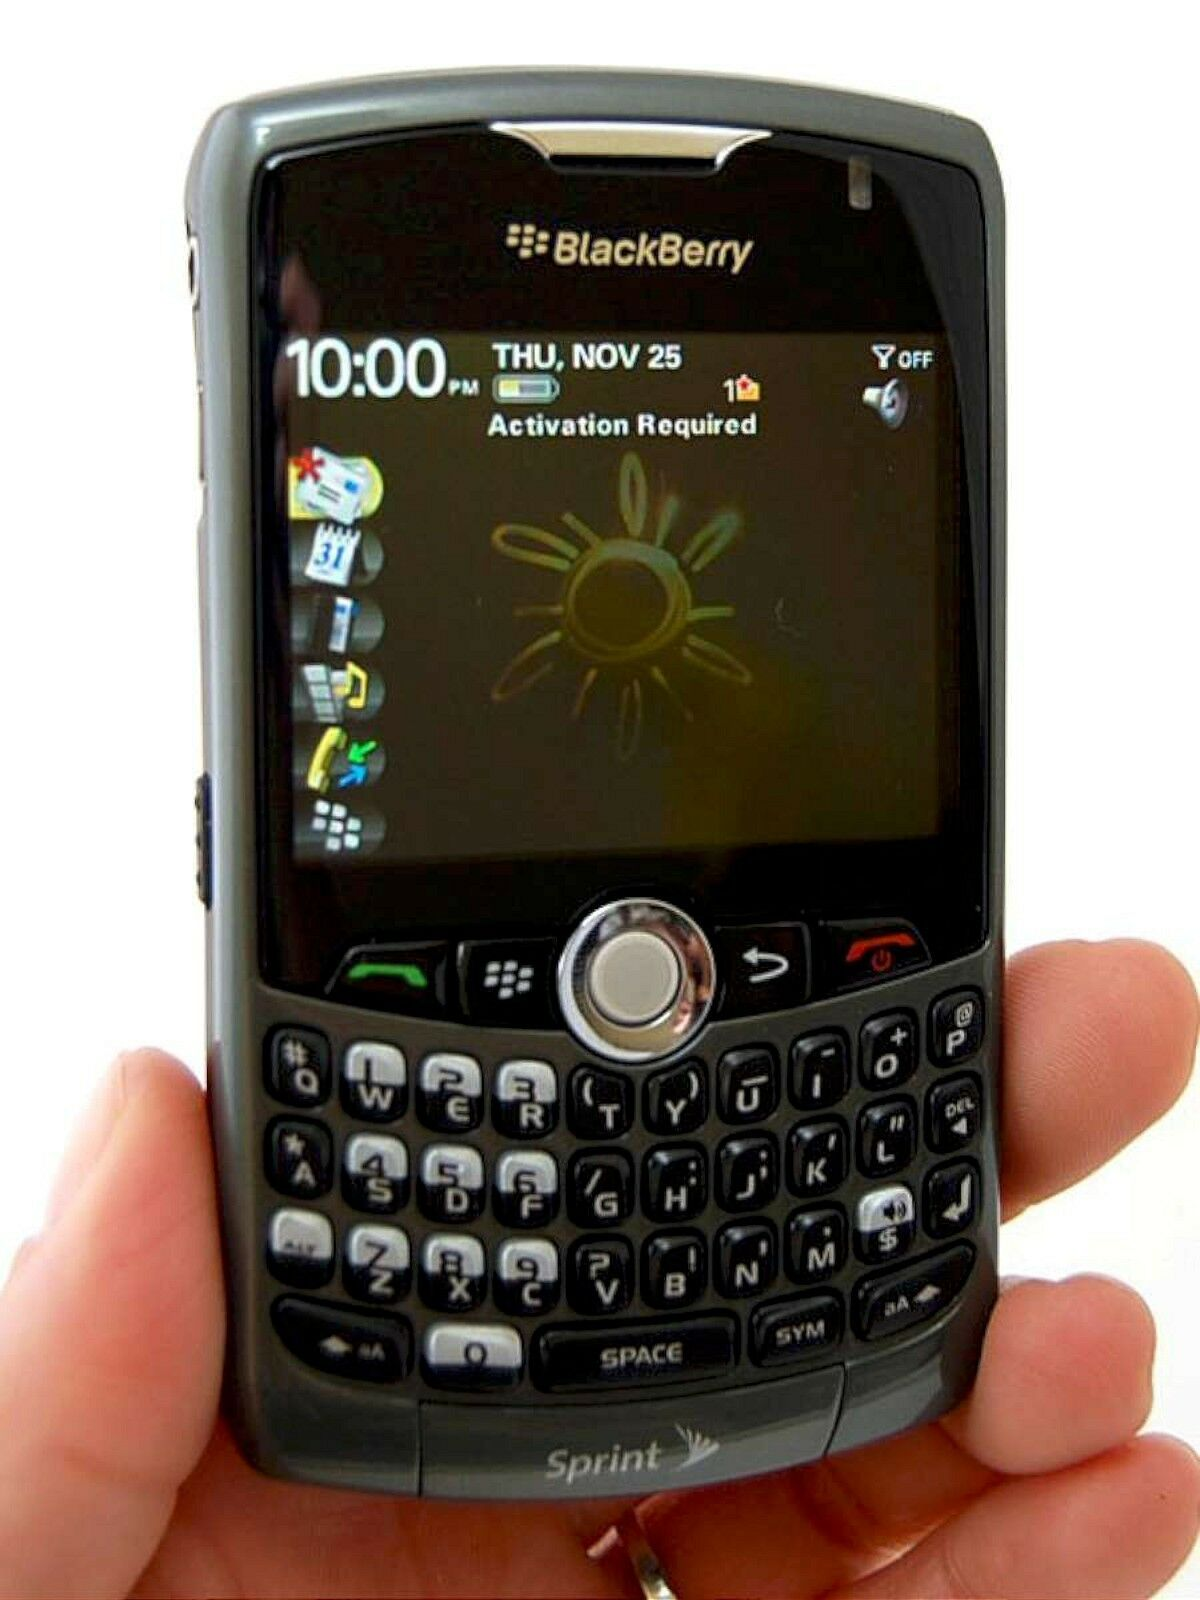 new blackberry curve 8330 sprint 3g cell phone titanium gray rim rh ebay com BlackBerry Electron New BlackBerry Phones for Verizon